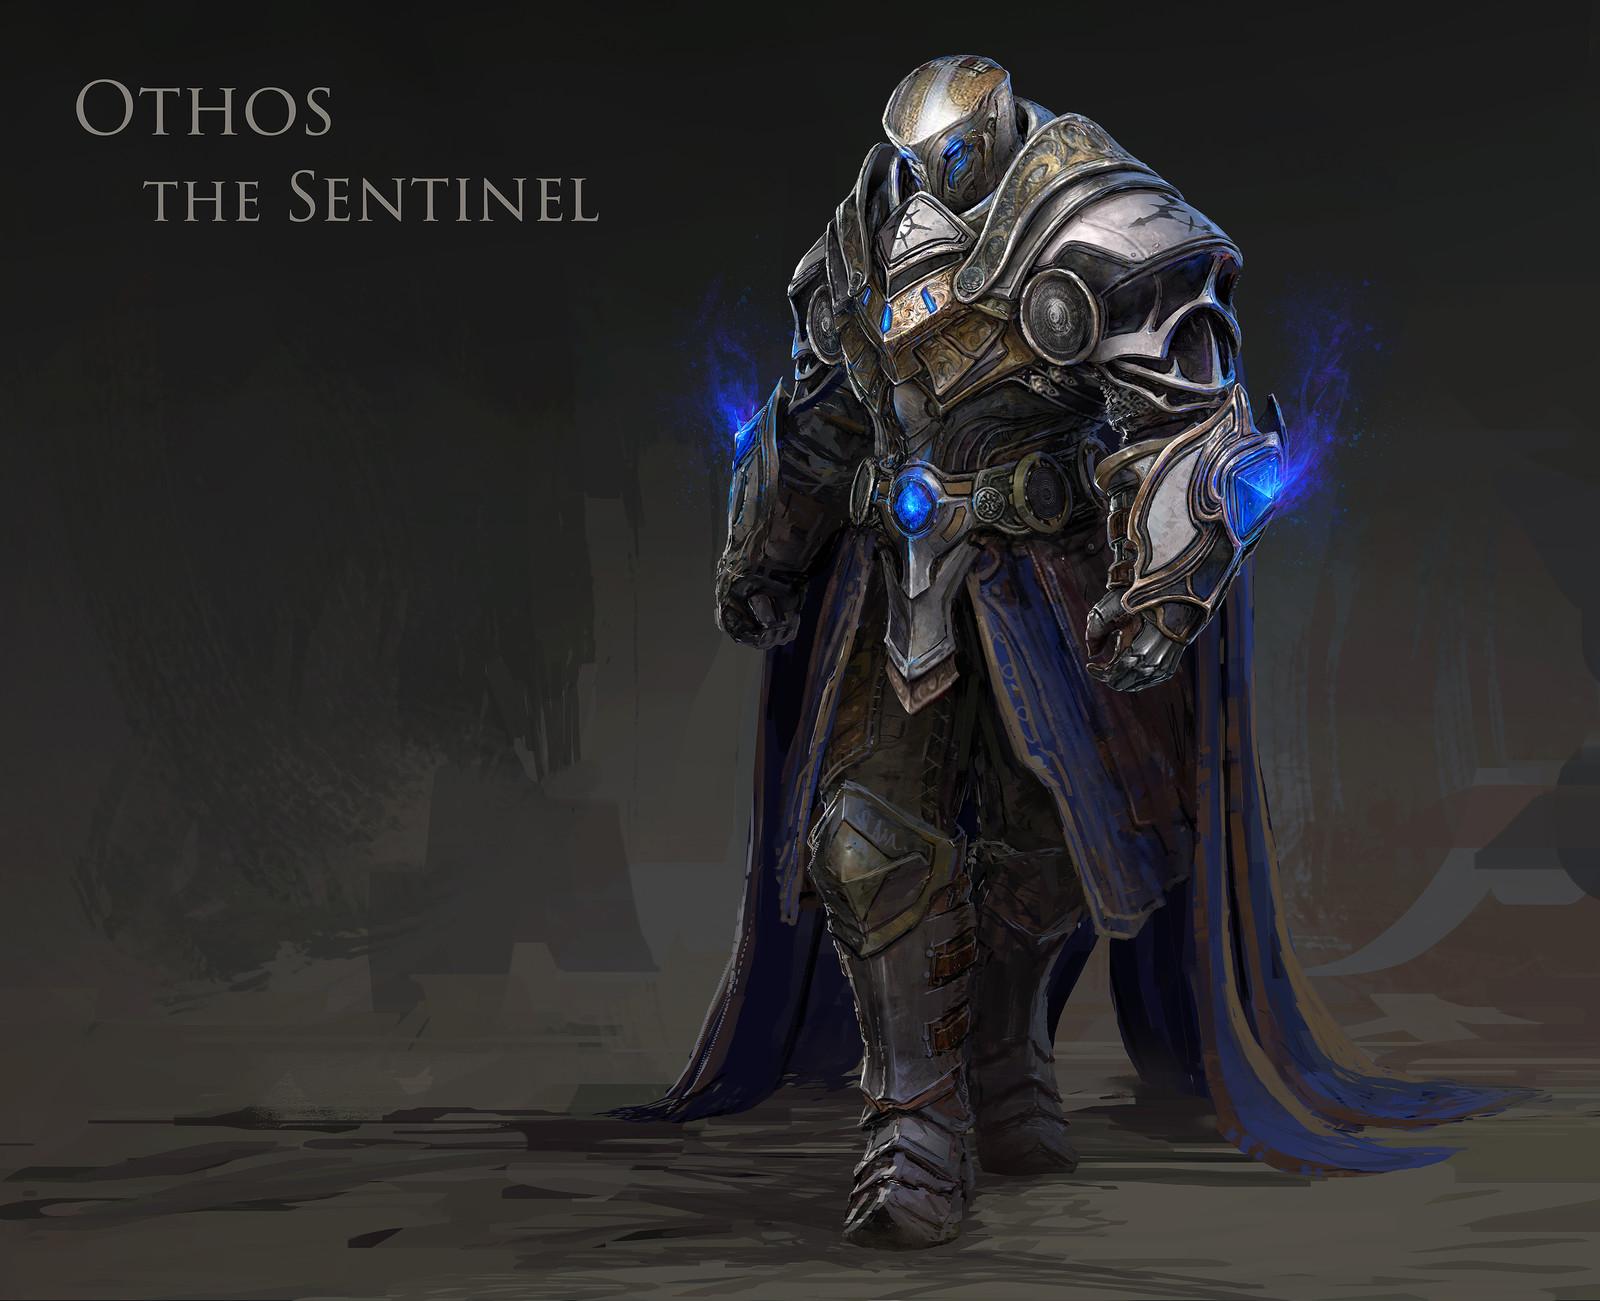 Othos the Sentinel